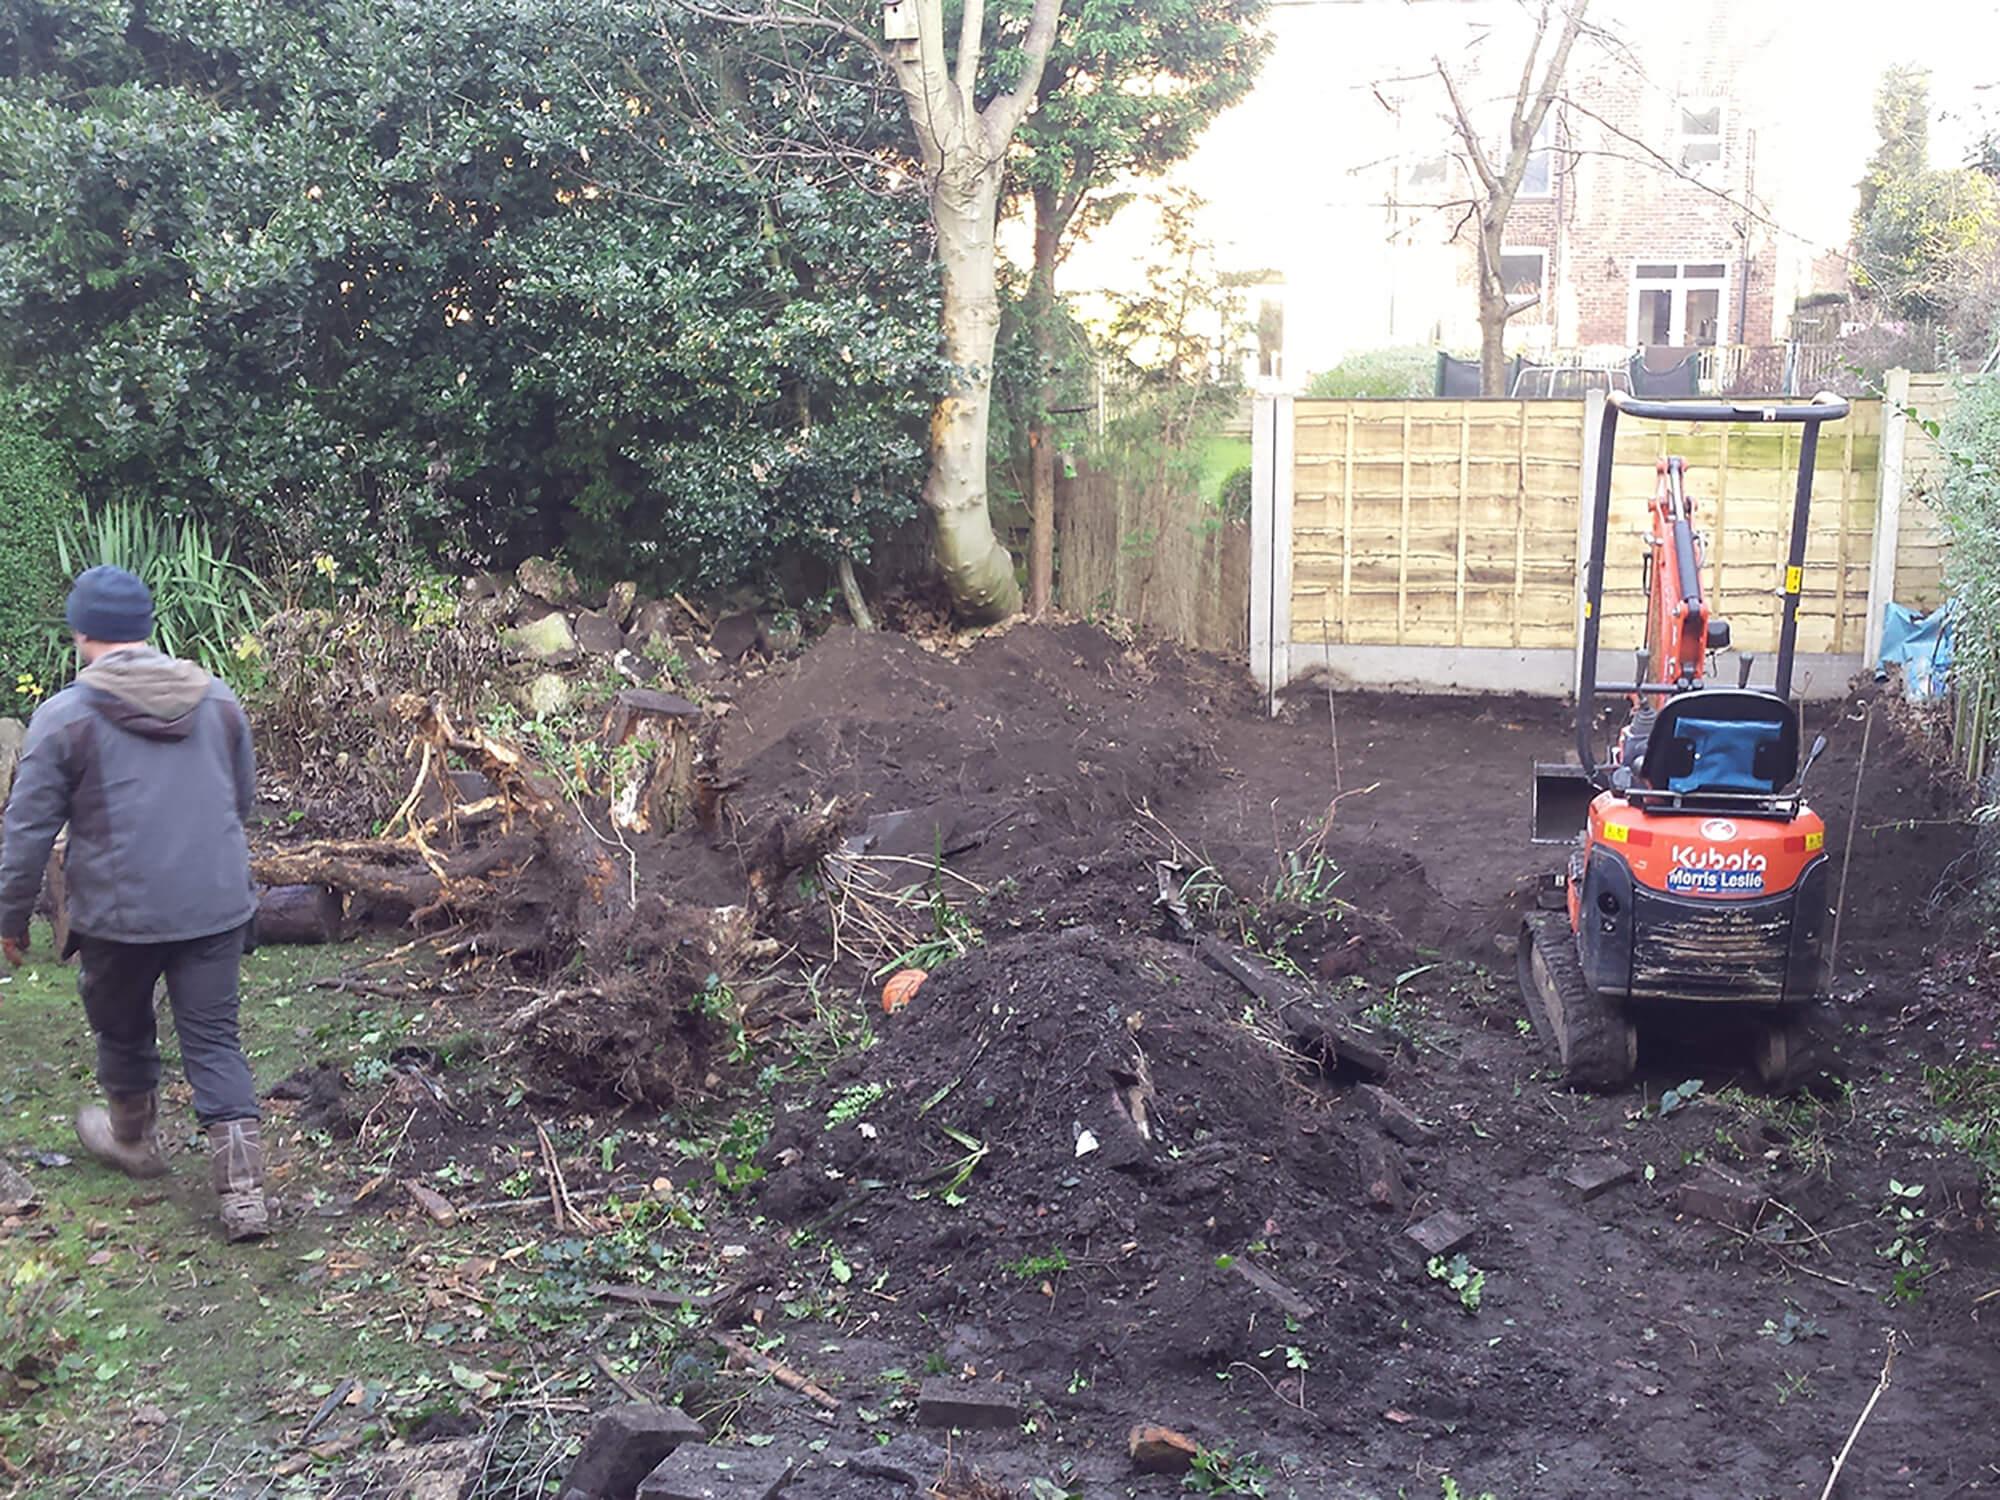 Private residence Heaton Moor garden construction in progress.